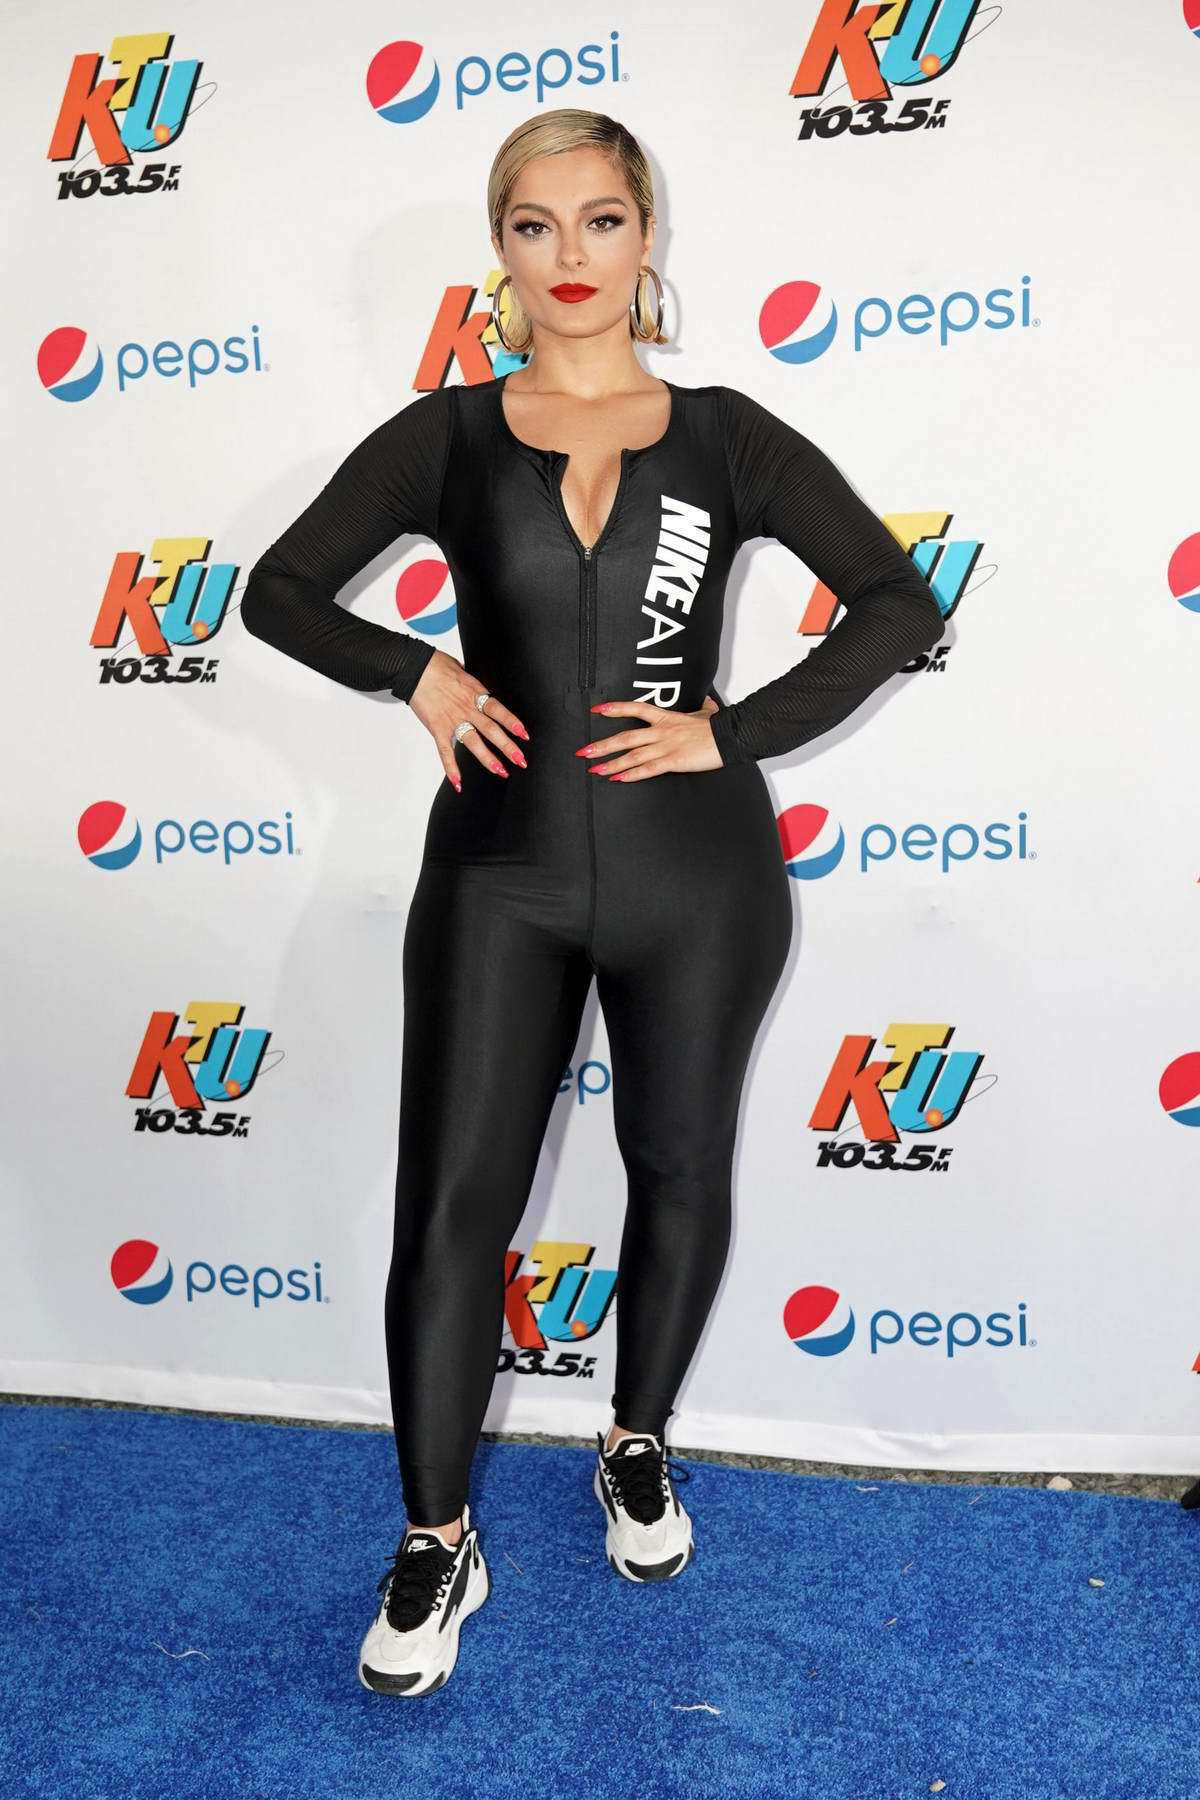 Pants Bebe Rexha Celebrity Leggings Top Bodysuit Wheretoget